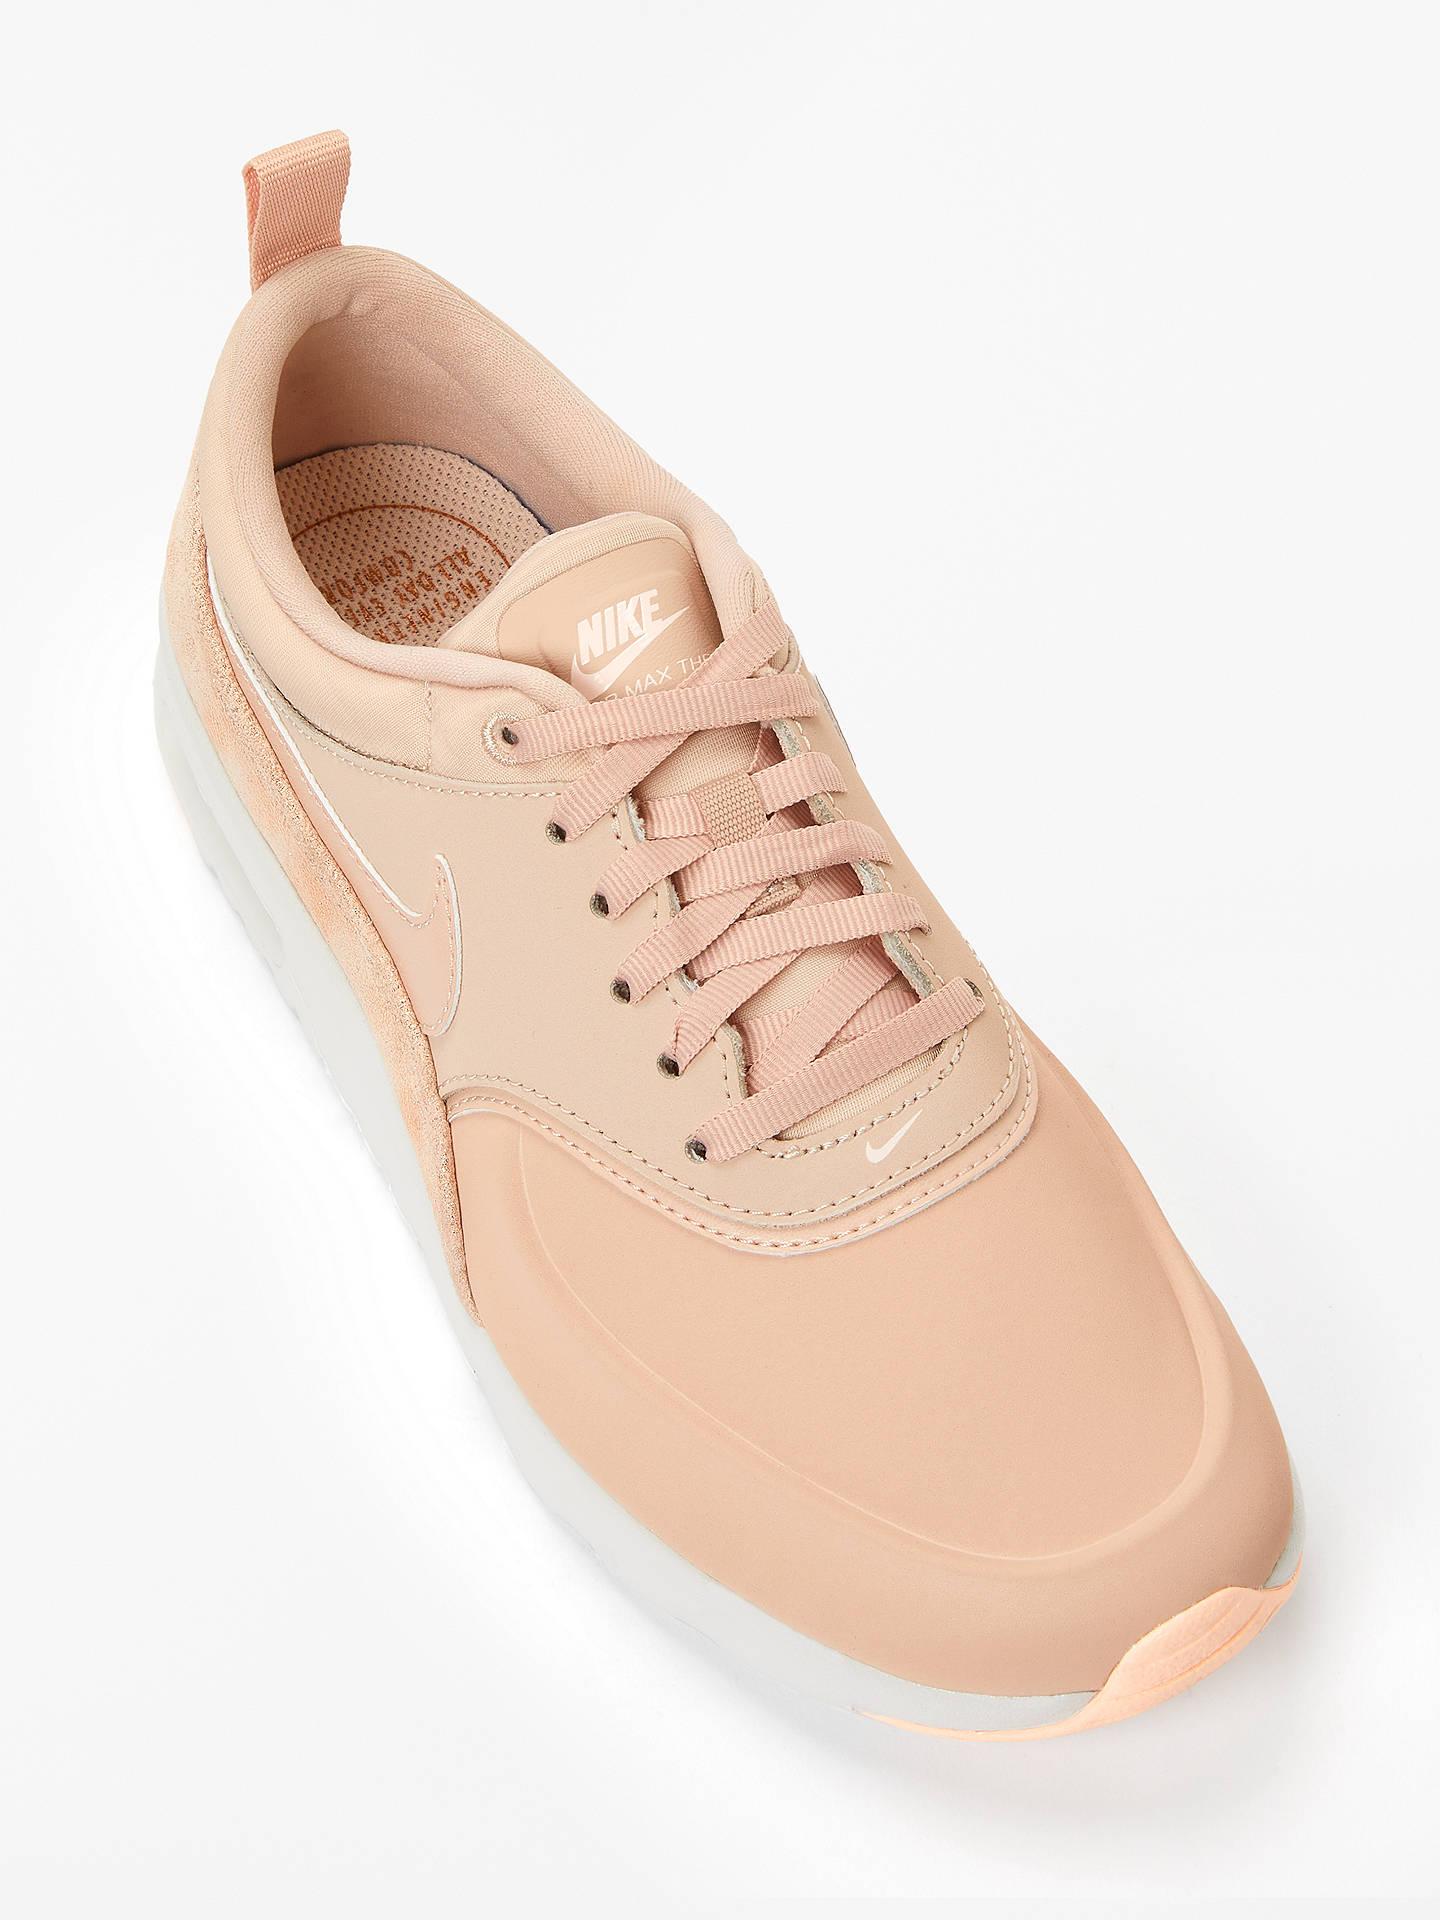 4b07e7404f2 ... Buy Nike Air Max Thea Premium Women s Trainers